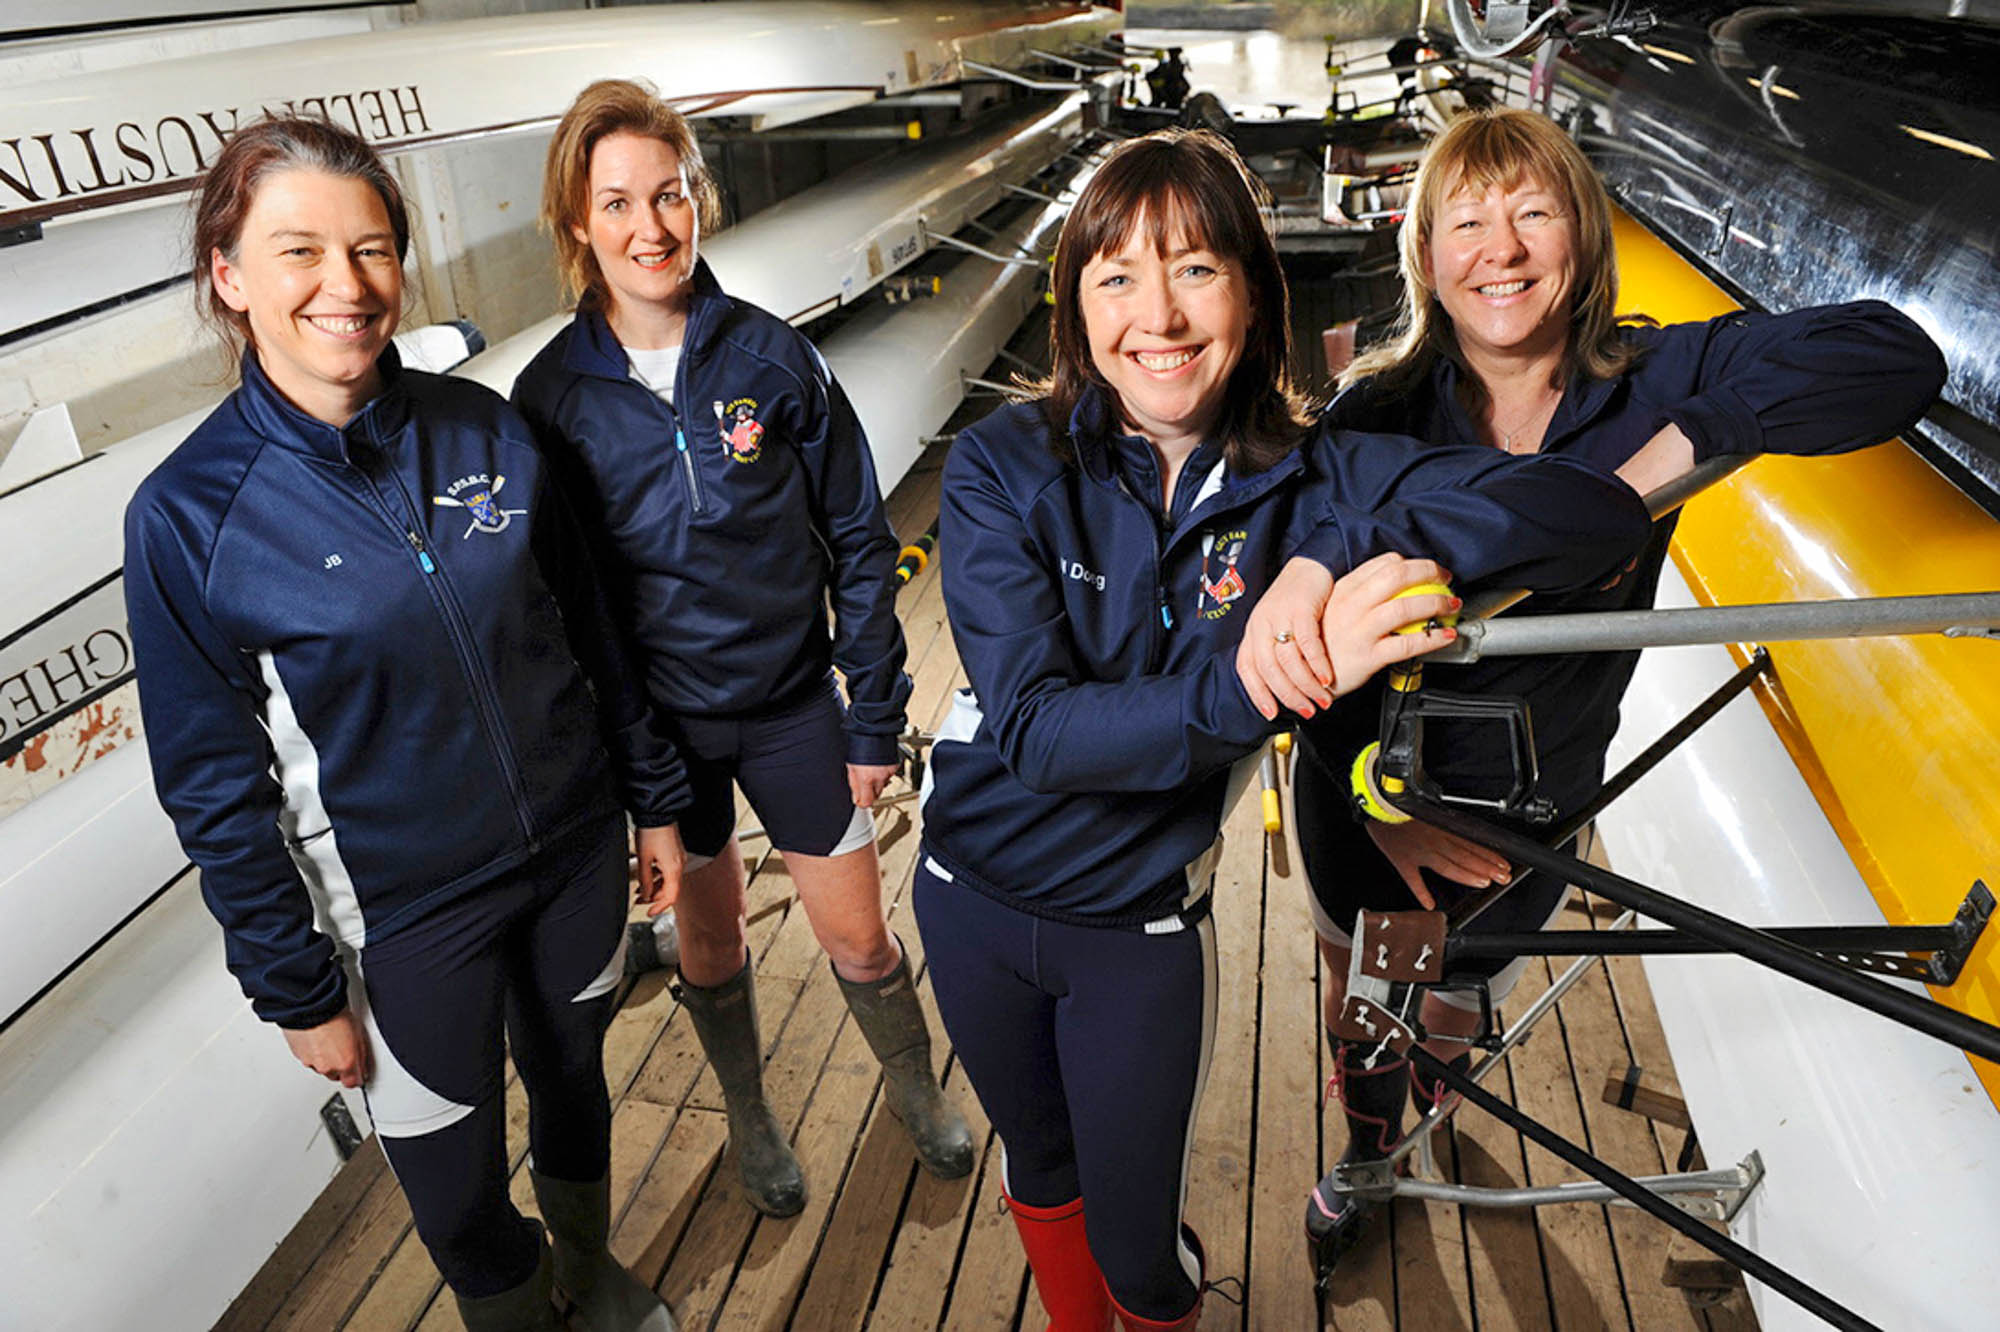 Frances Davies, Helen Butters, Niki Doeg und Janette Benaddi vor dem Start der Talisker Atlantic Challenge